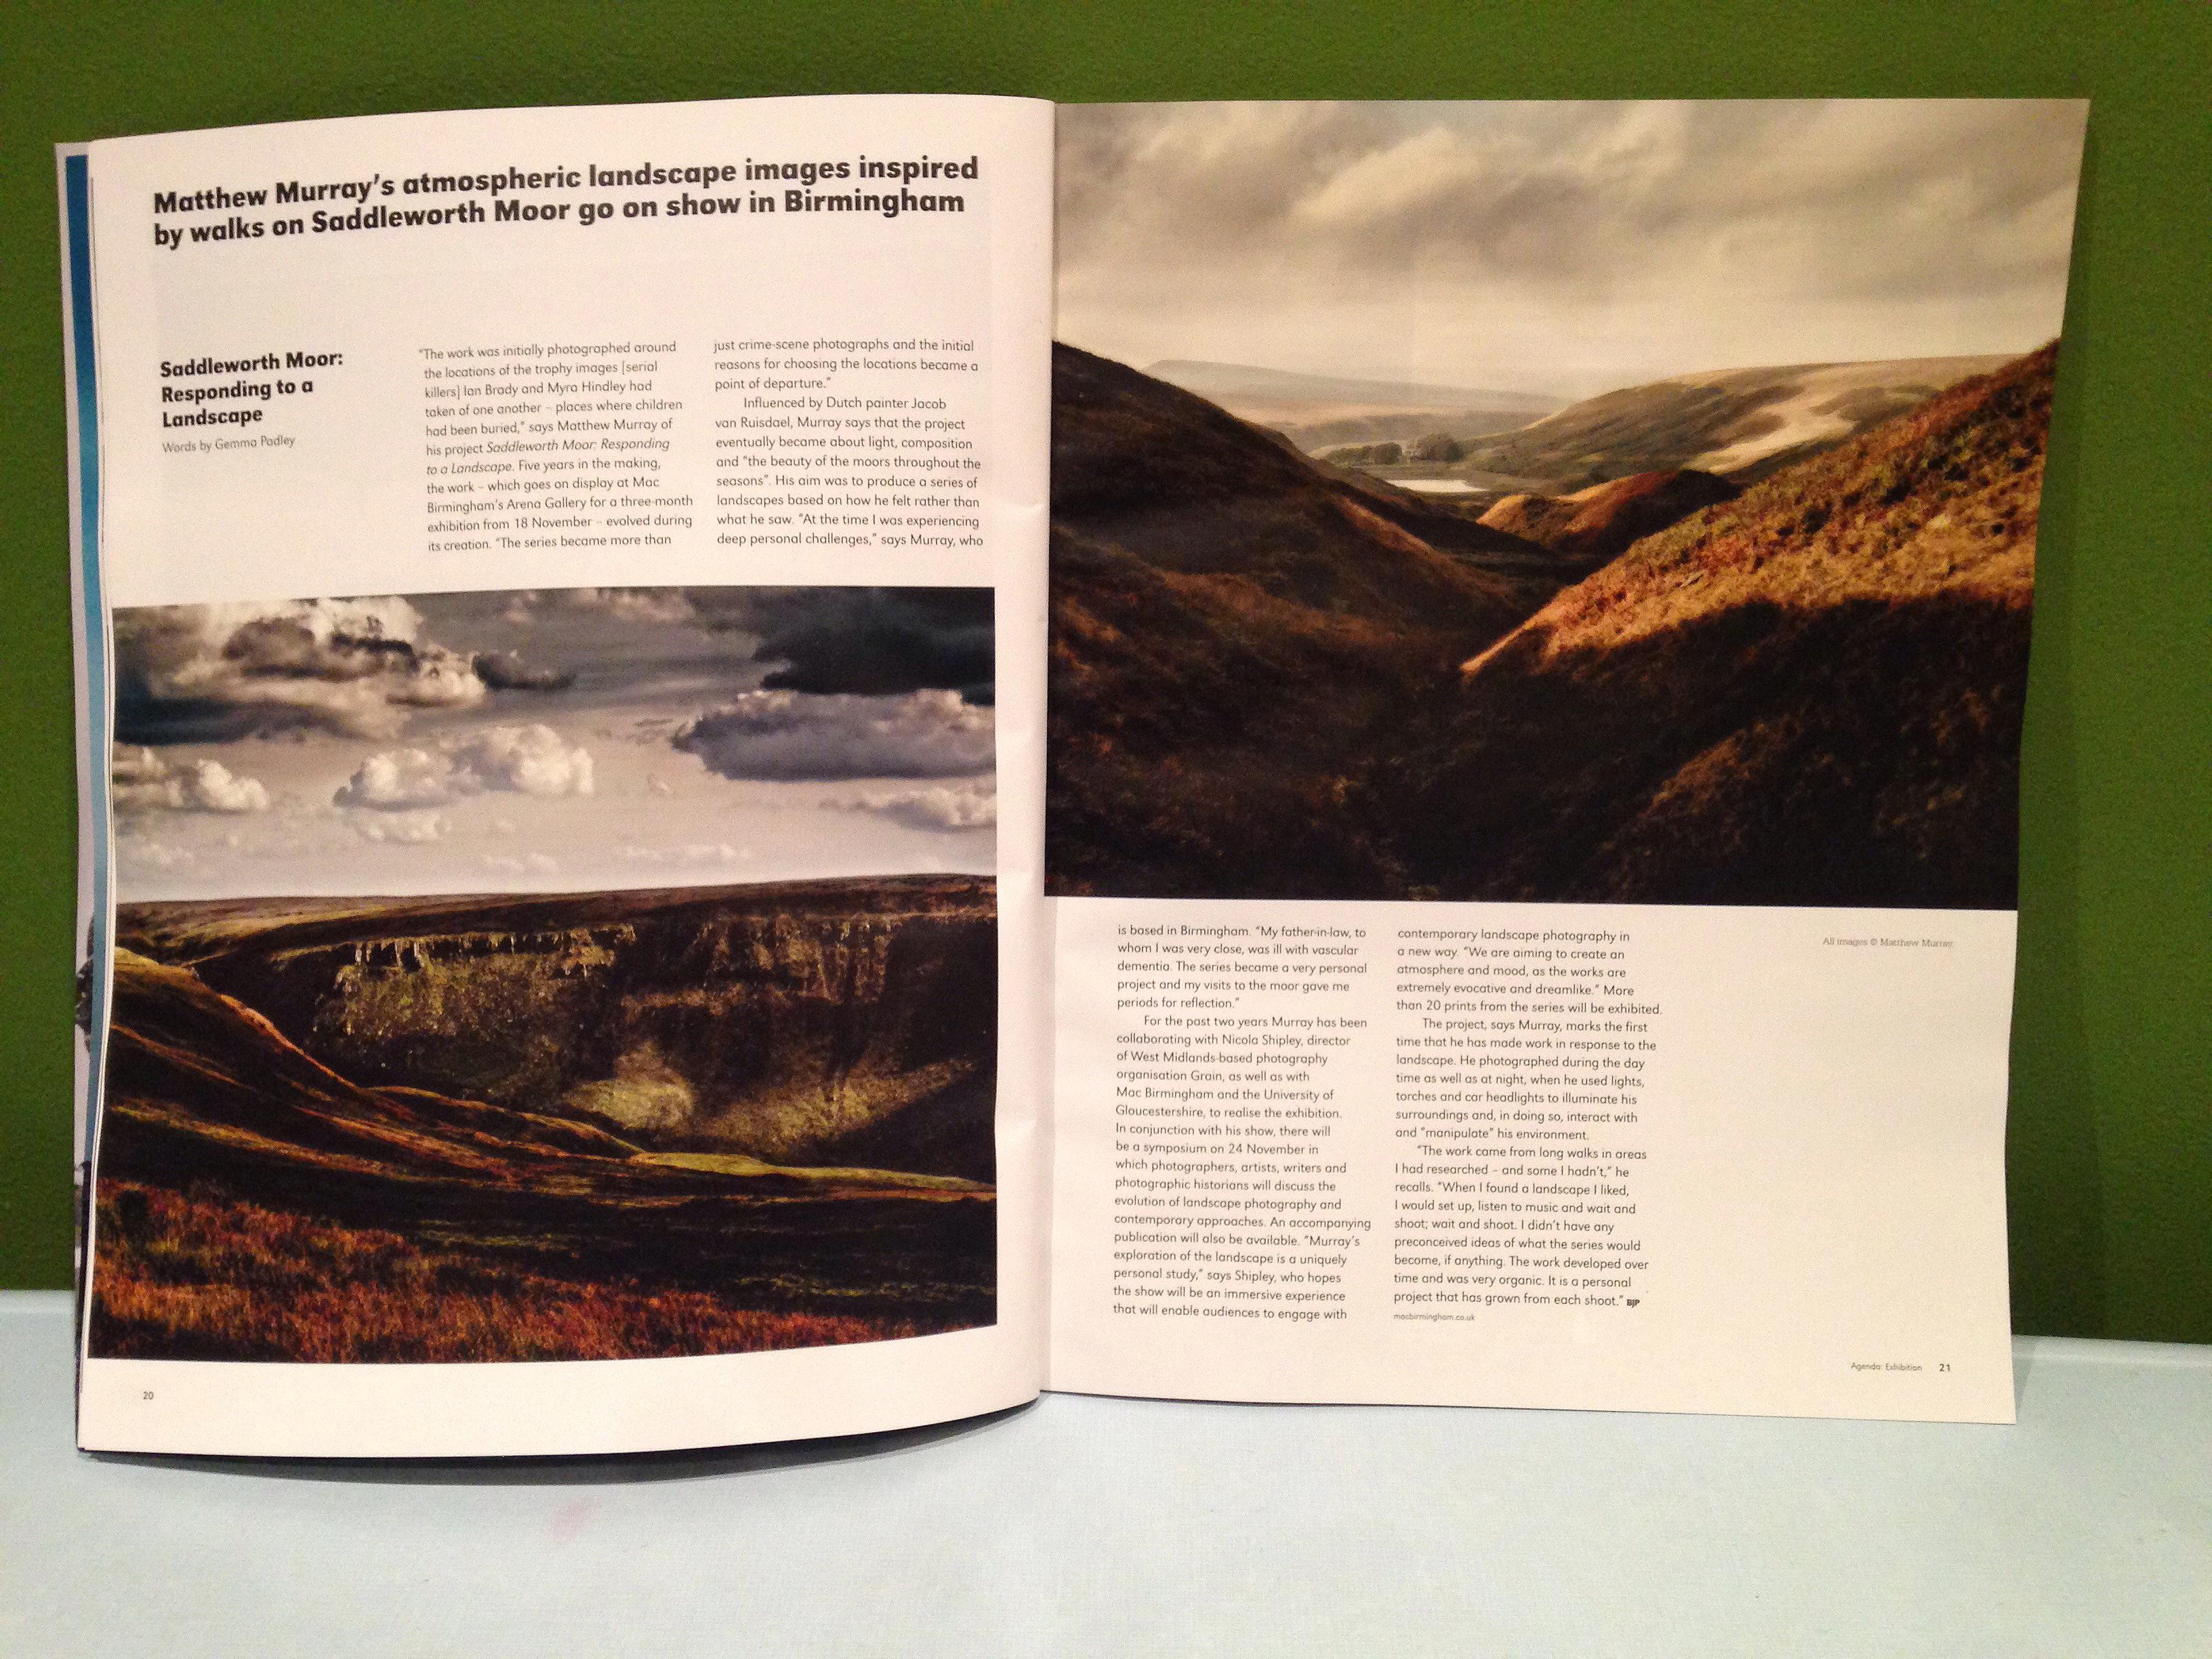 Matthew murrays atmospheric landscape images inspired by walks on saddleworth moor